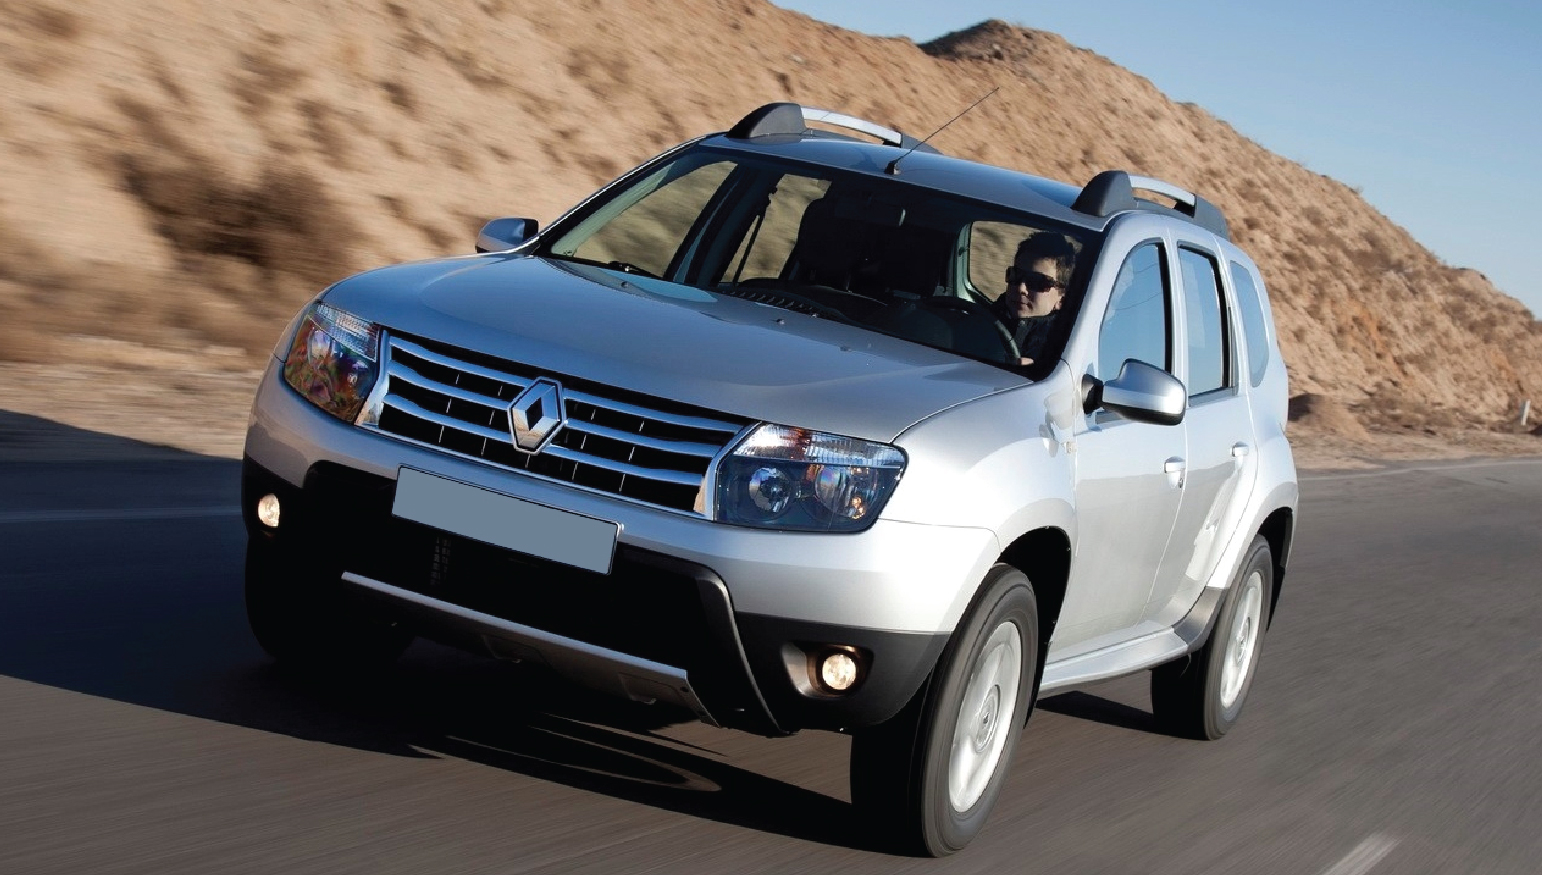 Cнижаем цены на кузовные запчасти для Renault DUSTER I до 80%